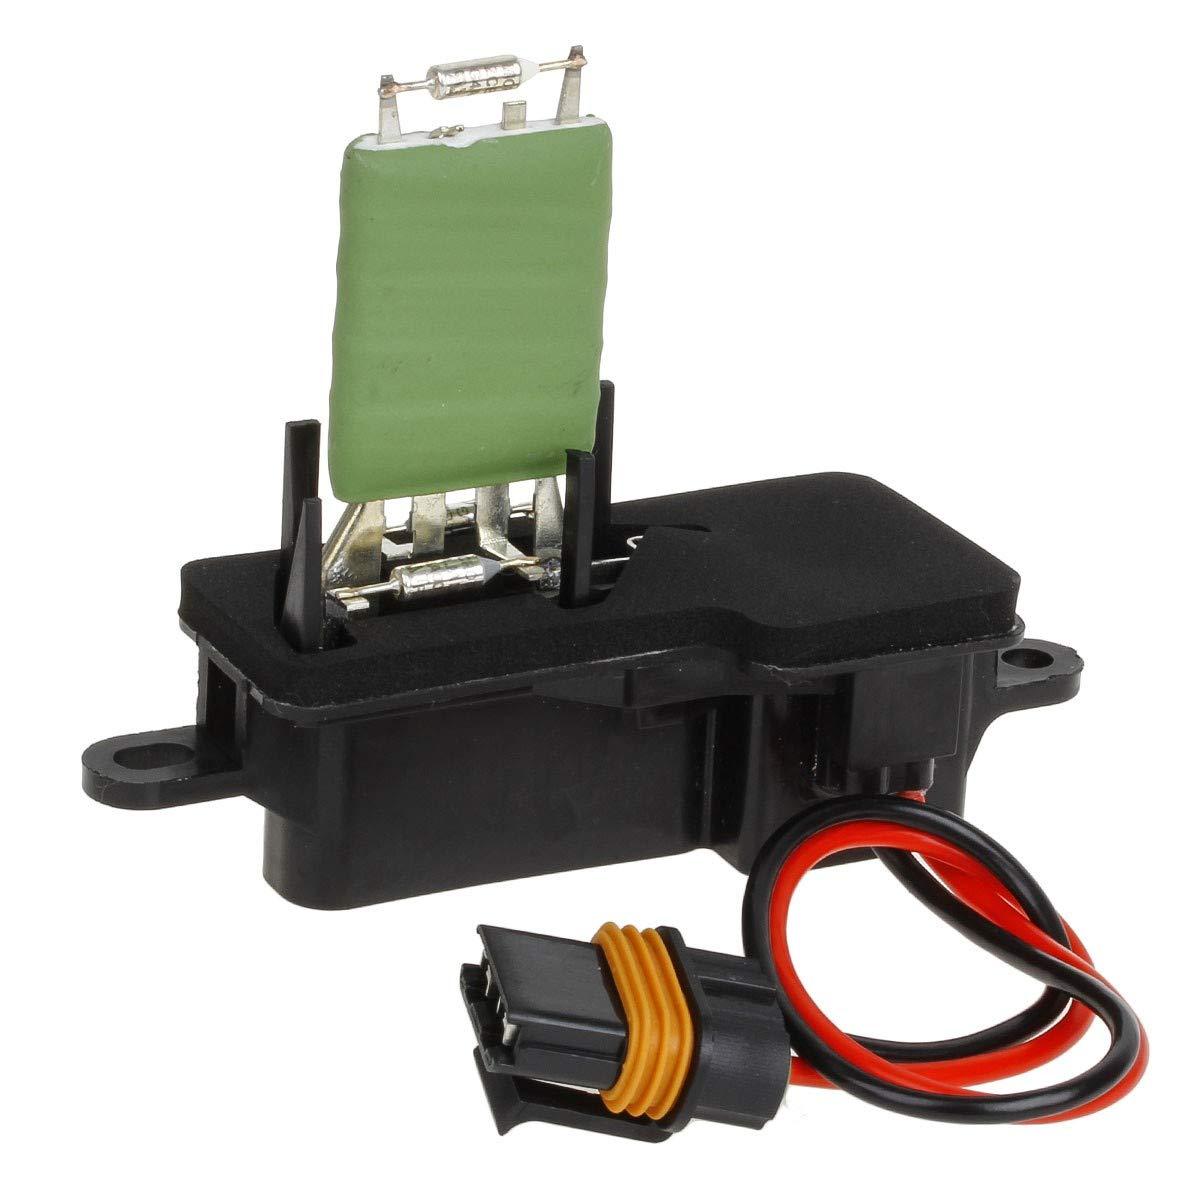 Amazon.com: PartsSquare NEW A/C Blower Motor Resistor 89018436 12135105  3A1043 BMR36 DR779 Replacement for 1996 1997 1998 1999 2000 2001 2002 2003  2004 2005 ...